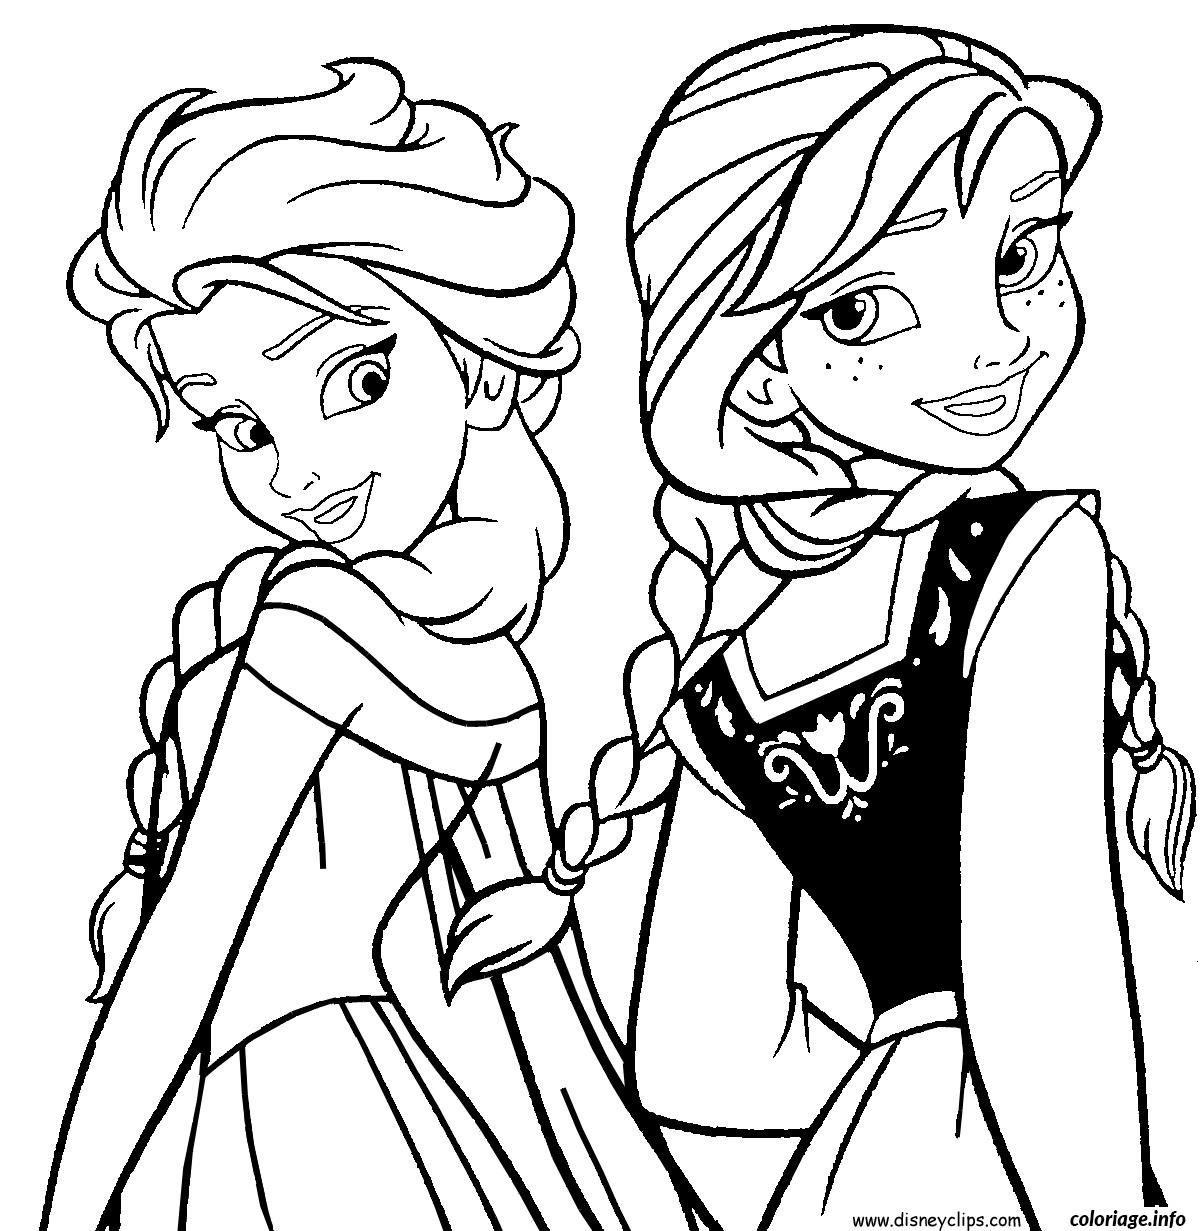 Coloriage Elsa Et Anna Reine Des Neiges Dessin à Imprimer Imprimer